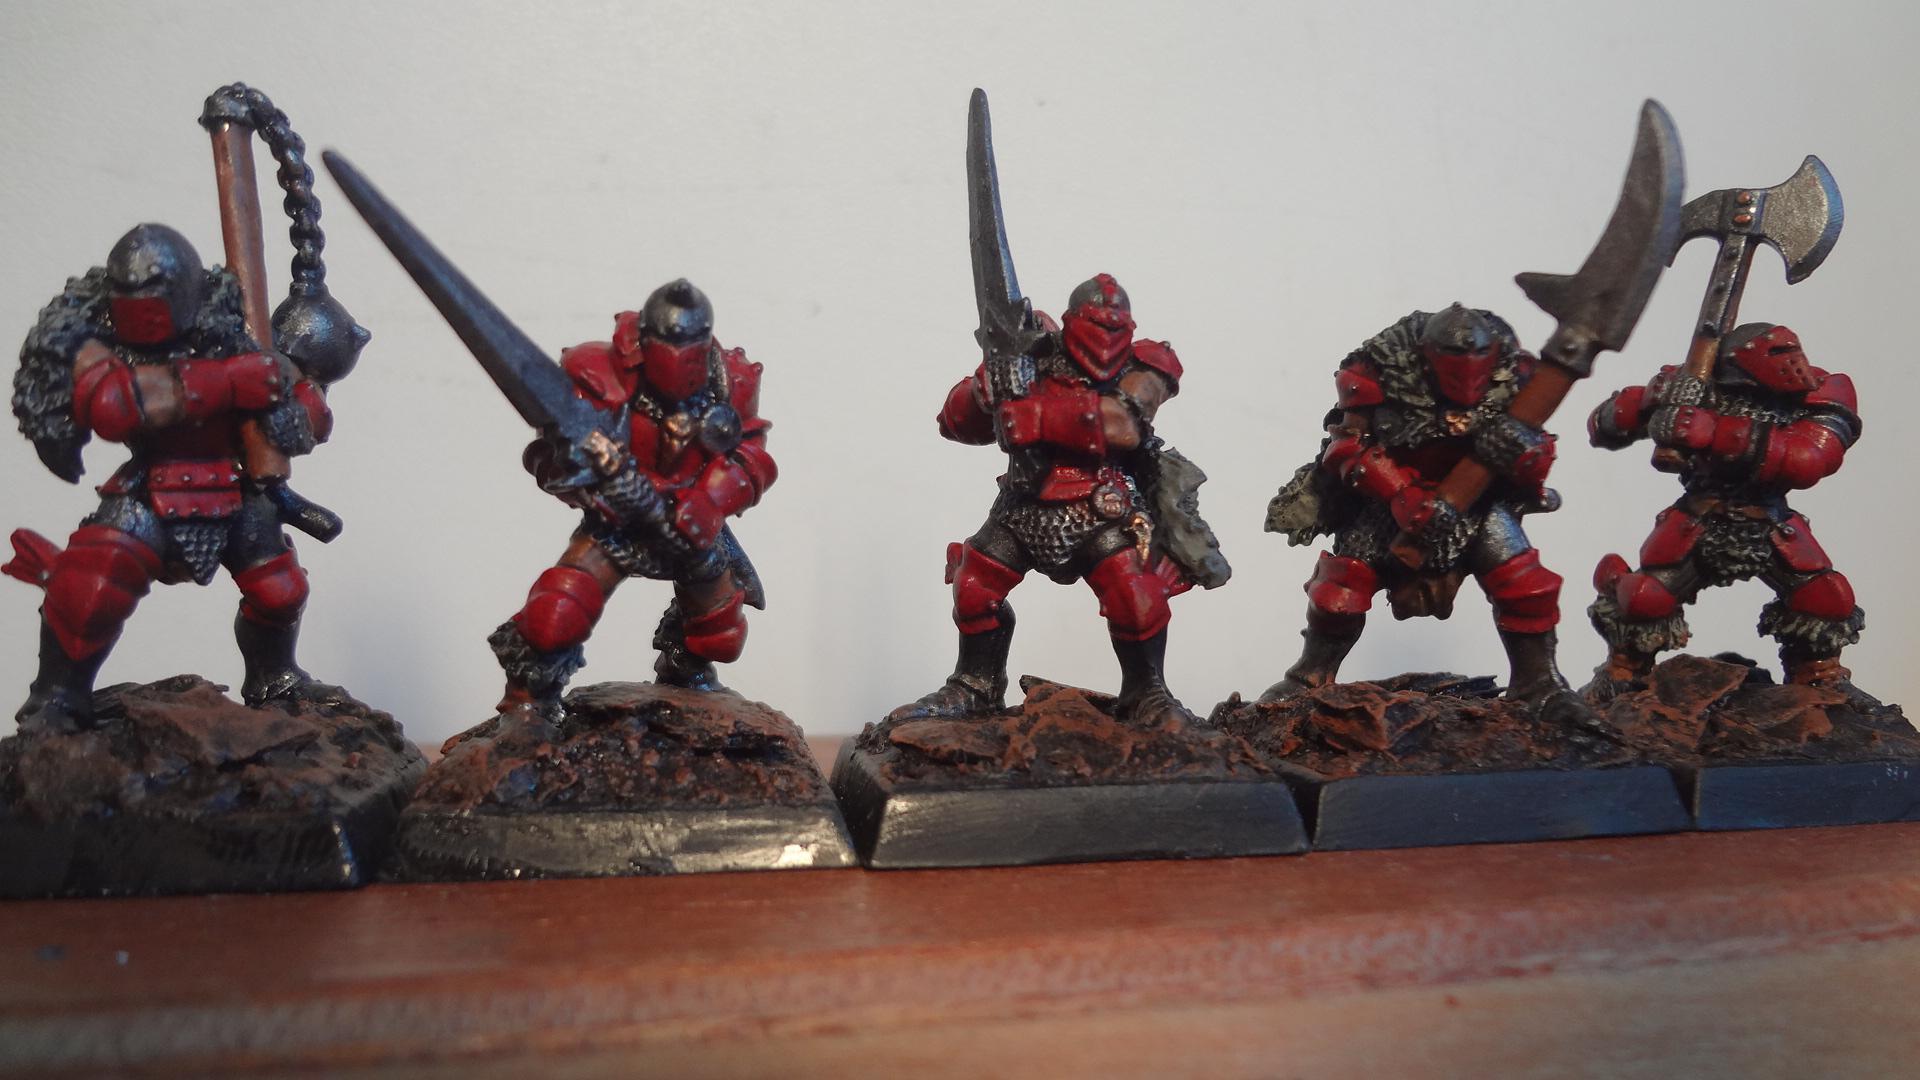 Dipped, Fantasy Warriors, Grenadier, Vintage, Warhammer Fantasy